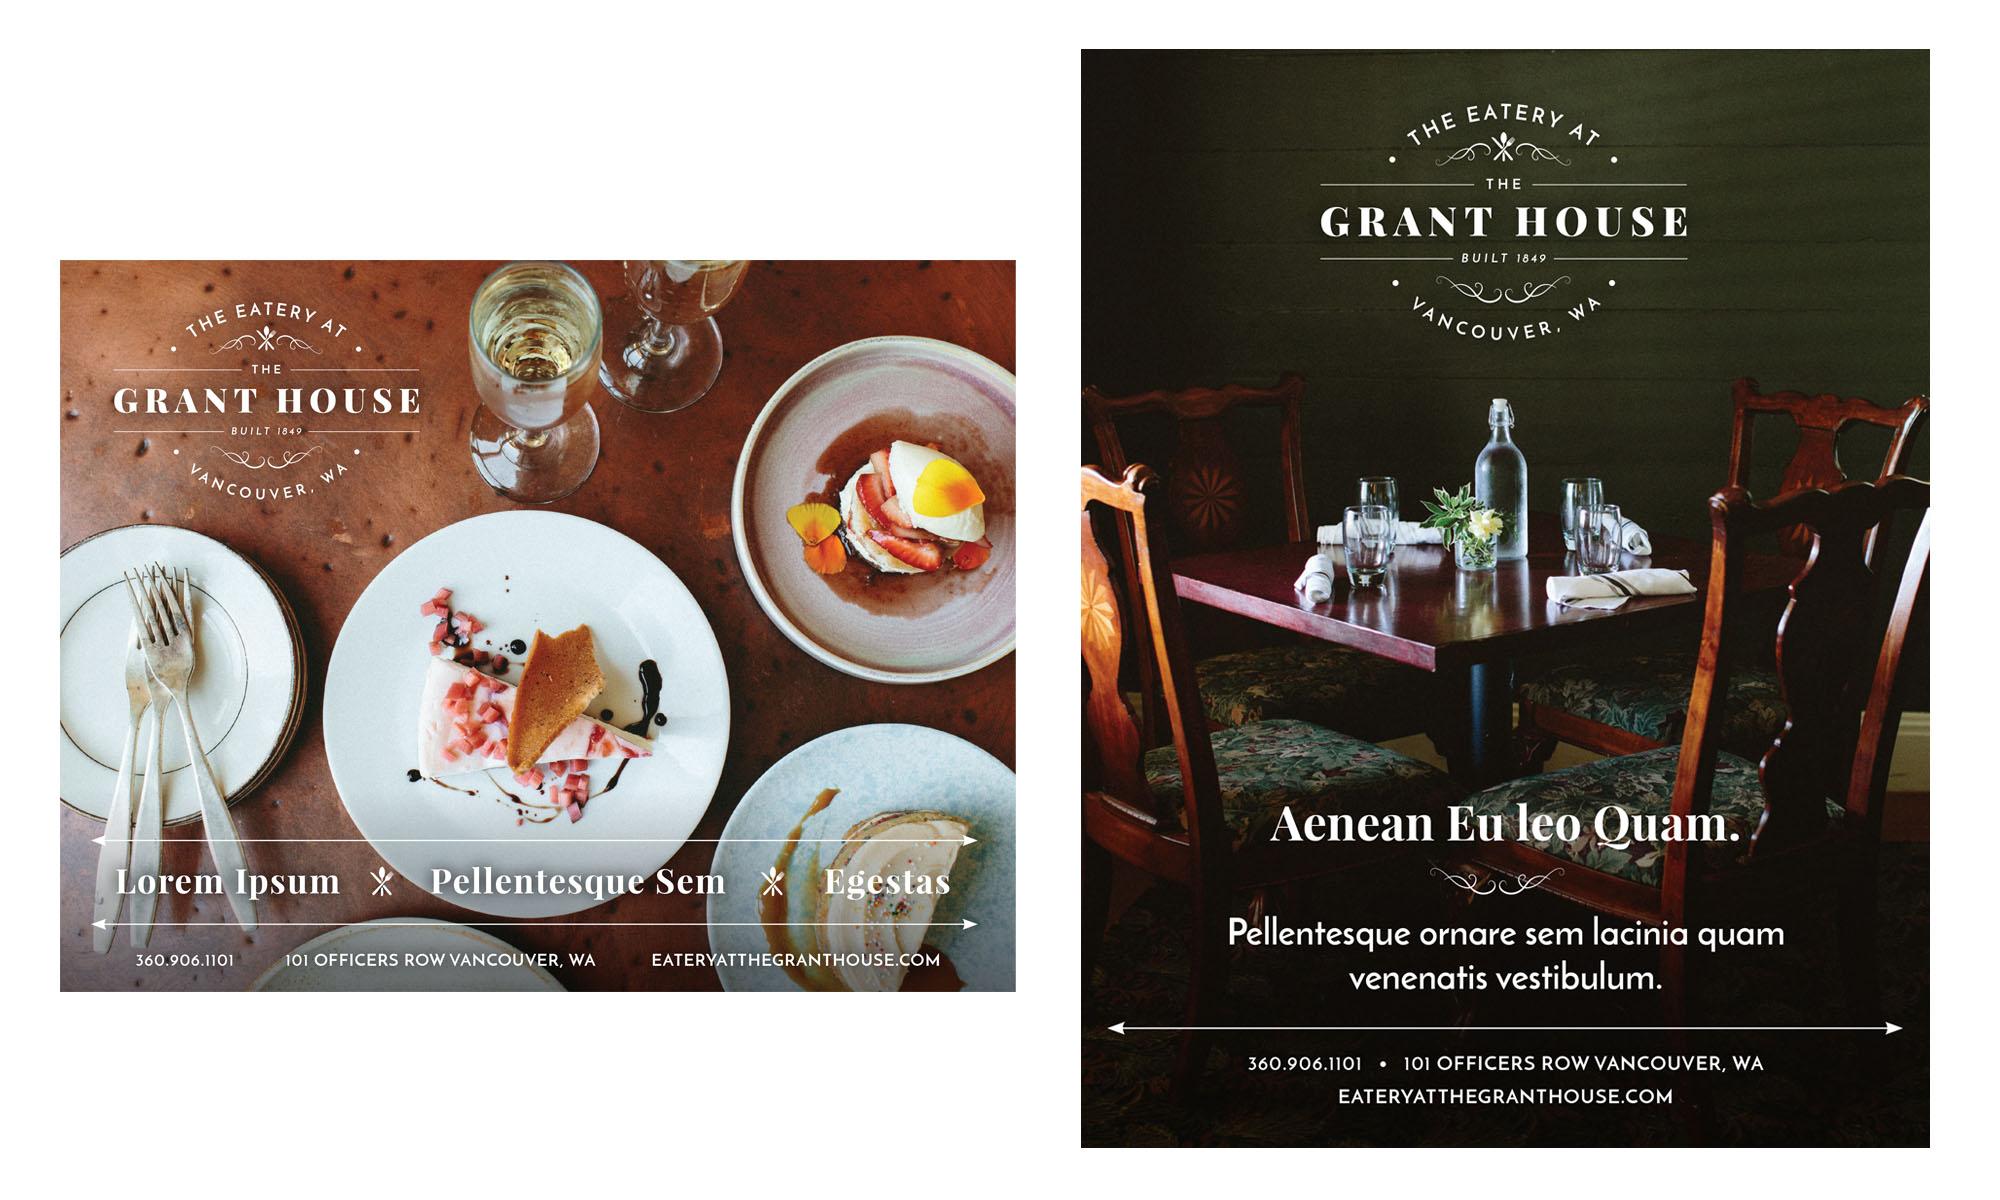 GrantHouse3.jpg